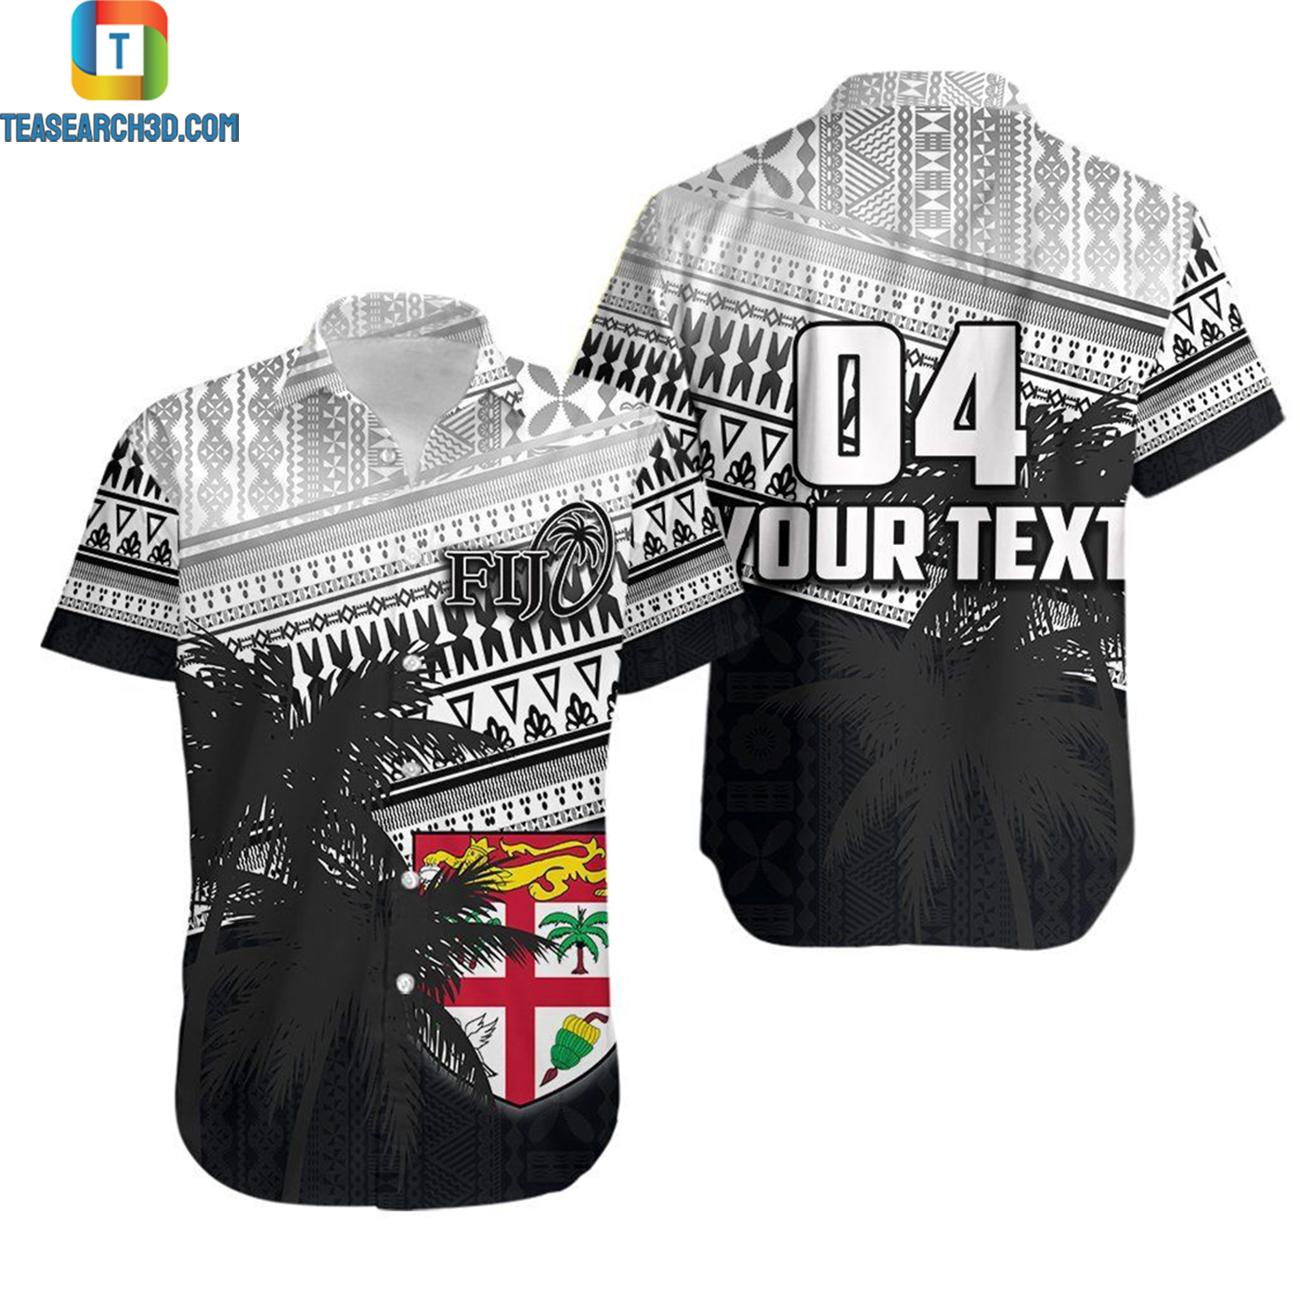 Fiji rugby makare and tapa patterns personalized hawaiian shirt 2